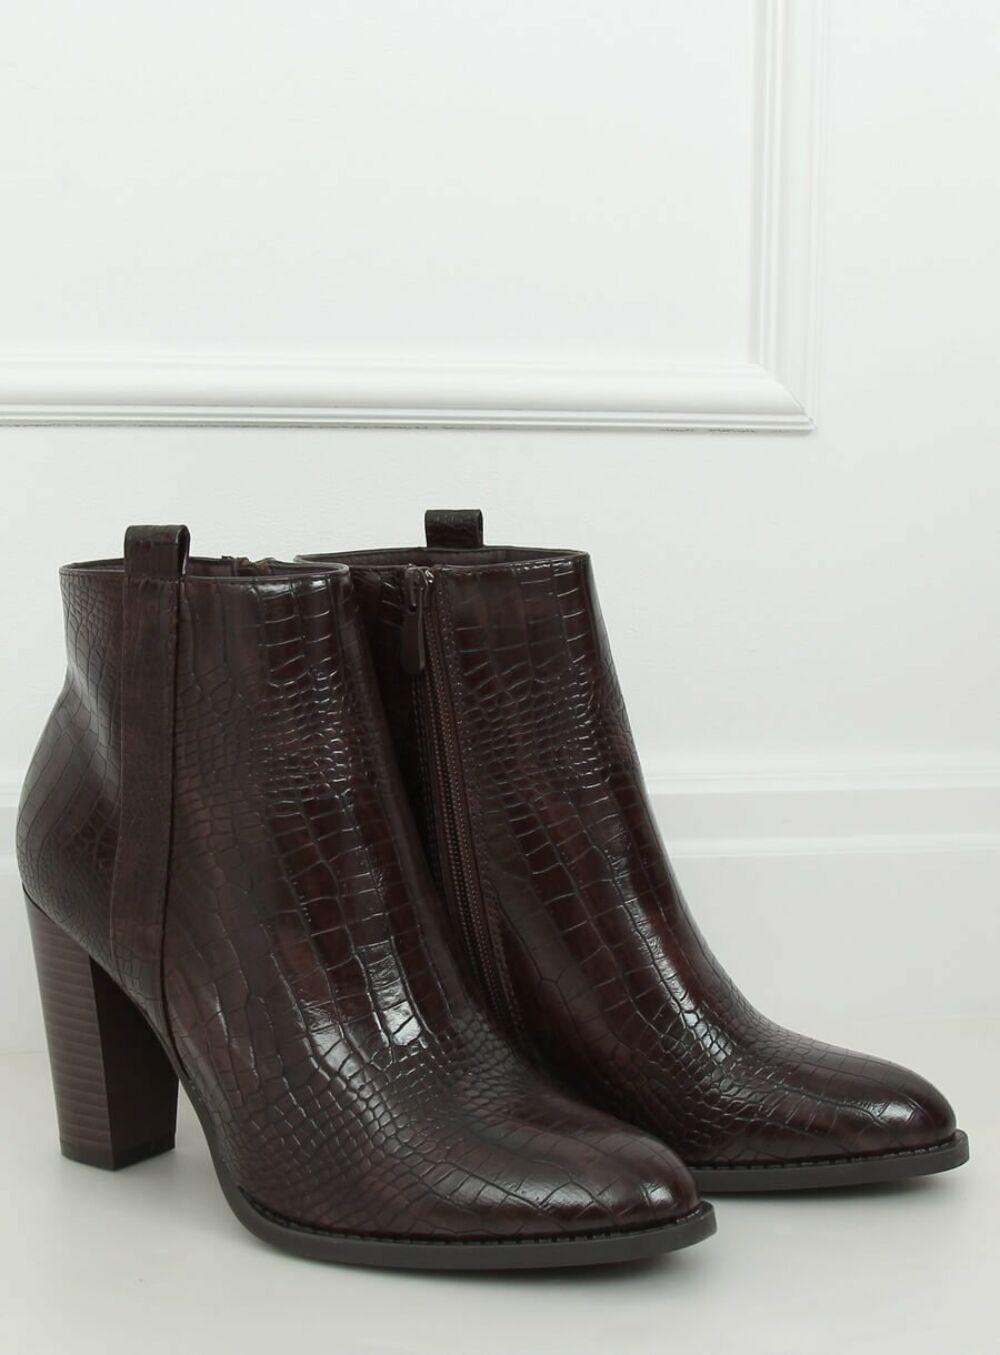 Női műbőr bokacsizma (UK10), barna